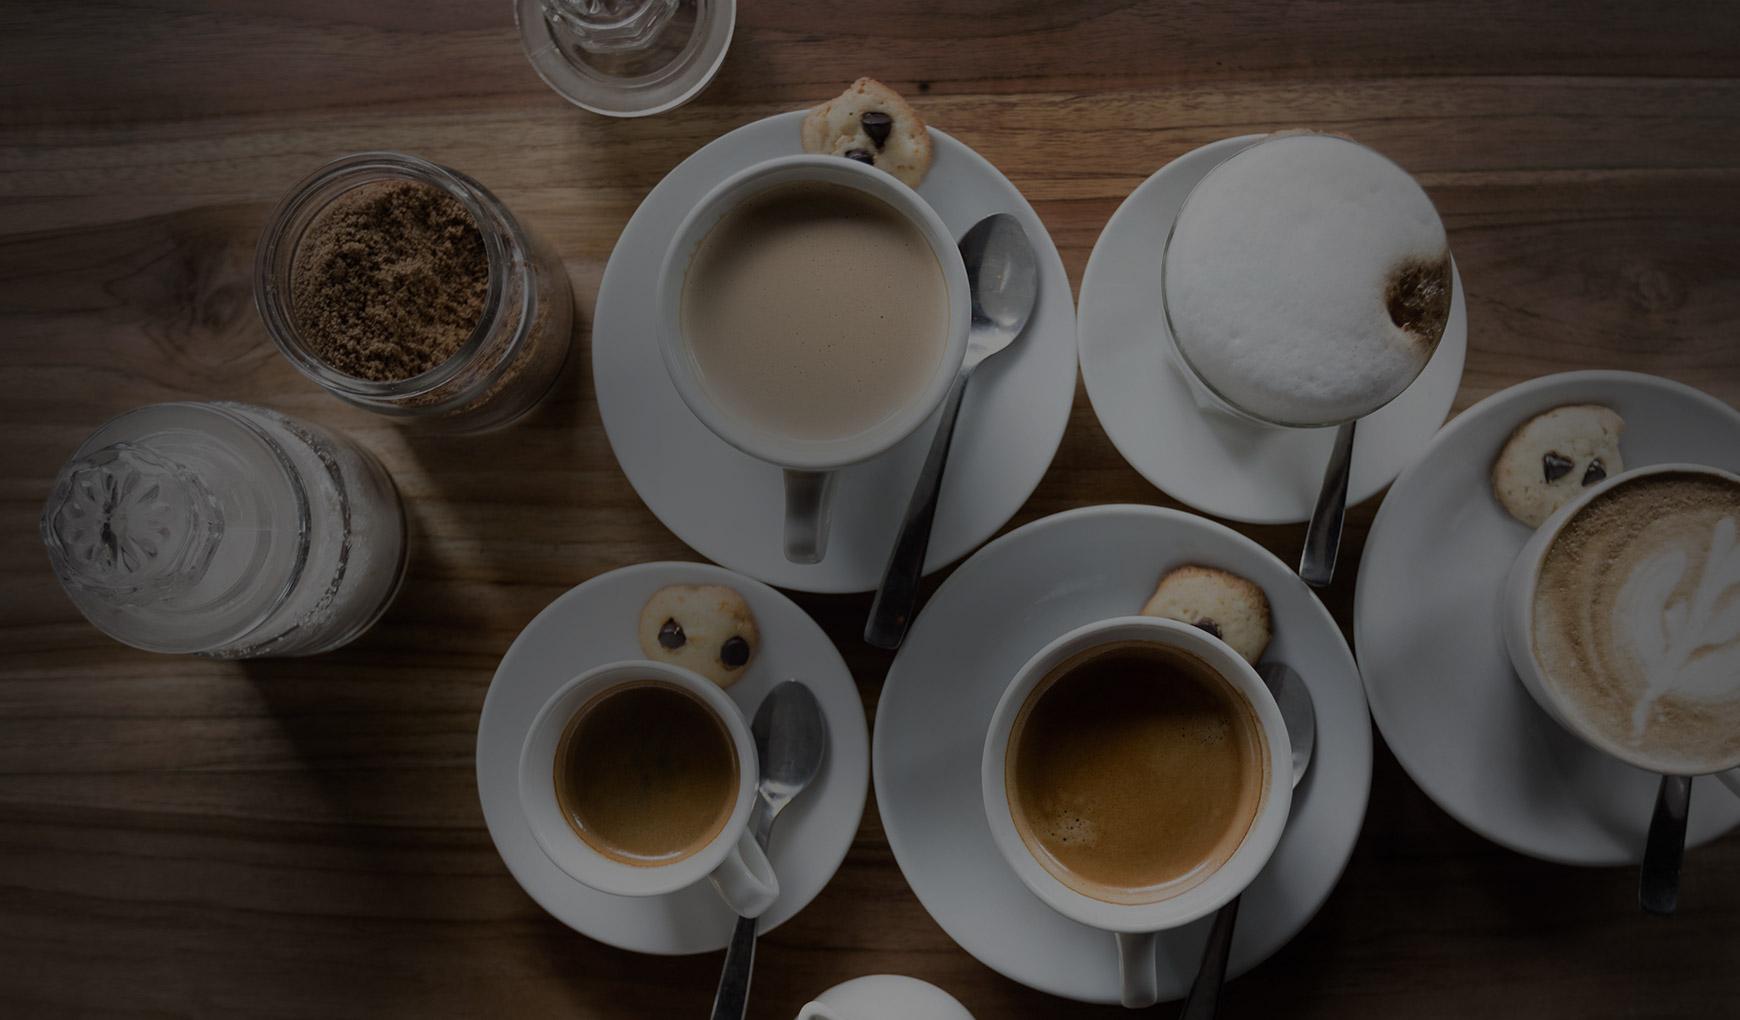 Slide Offerta Caffè Borbone